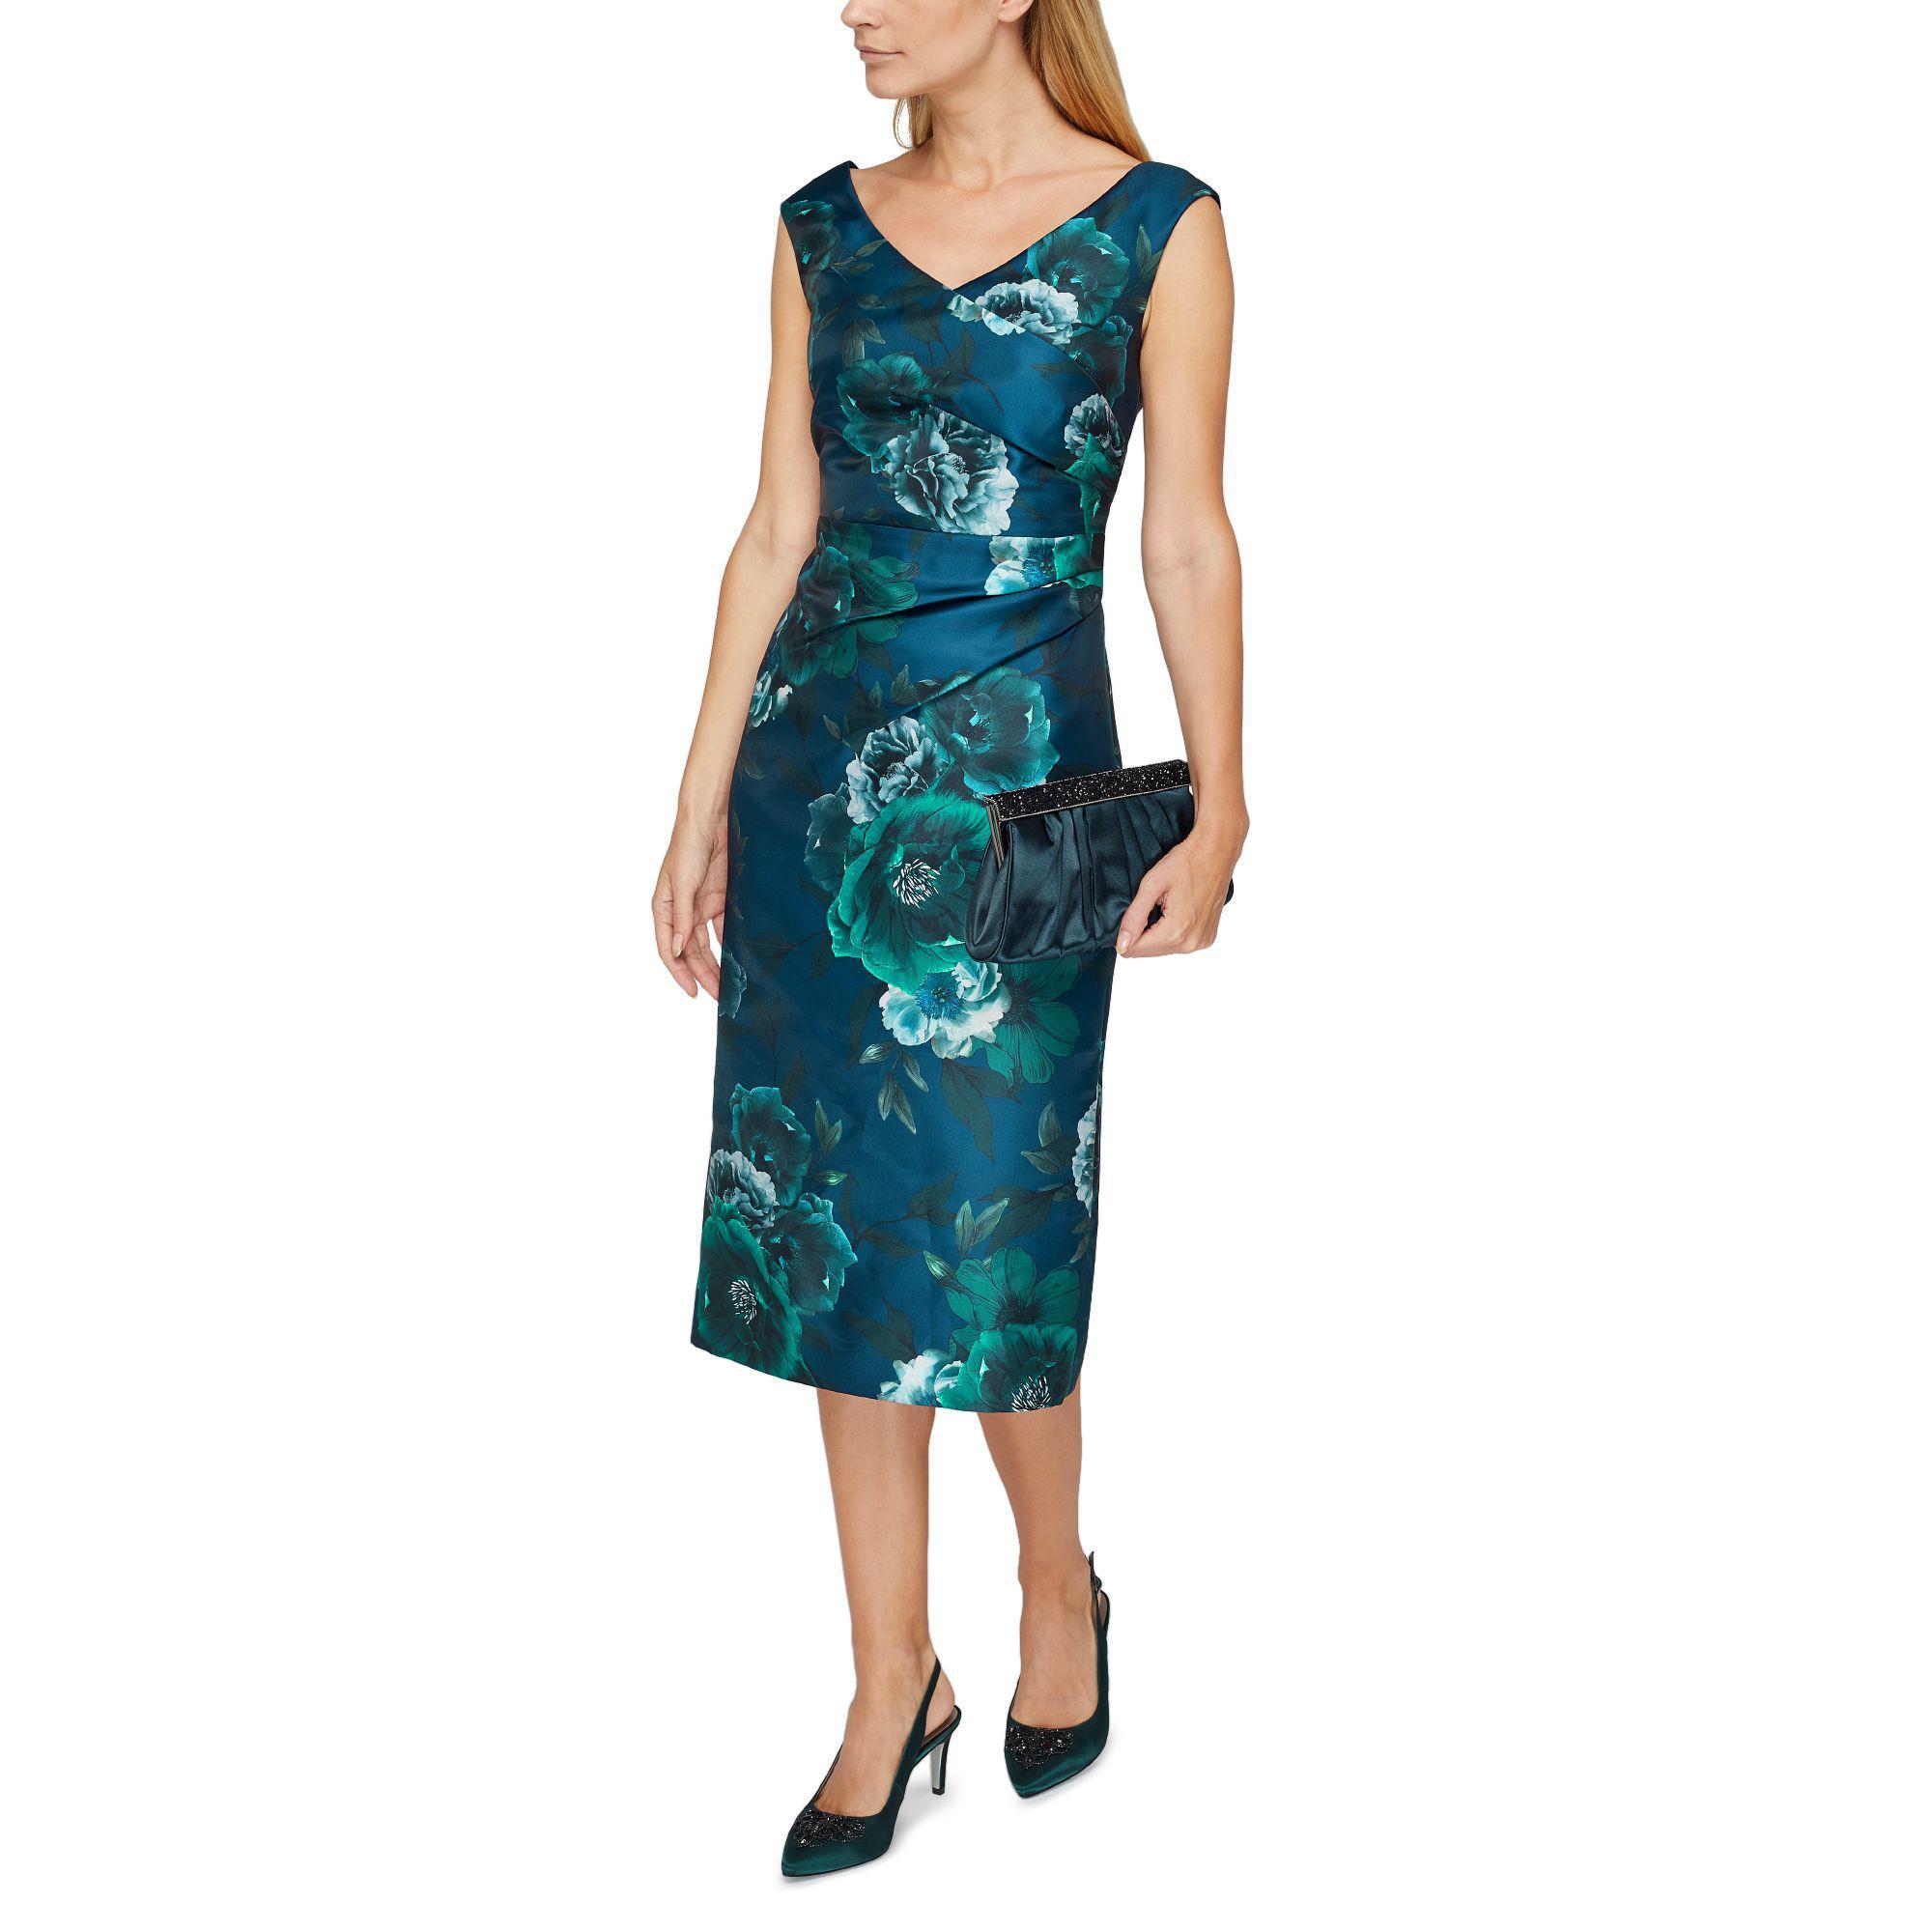 99f07c020 Jacques Vert Baroque Fleur Print Dress in Blue - Lyst